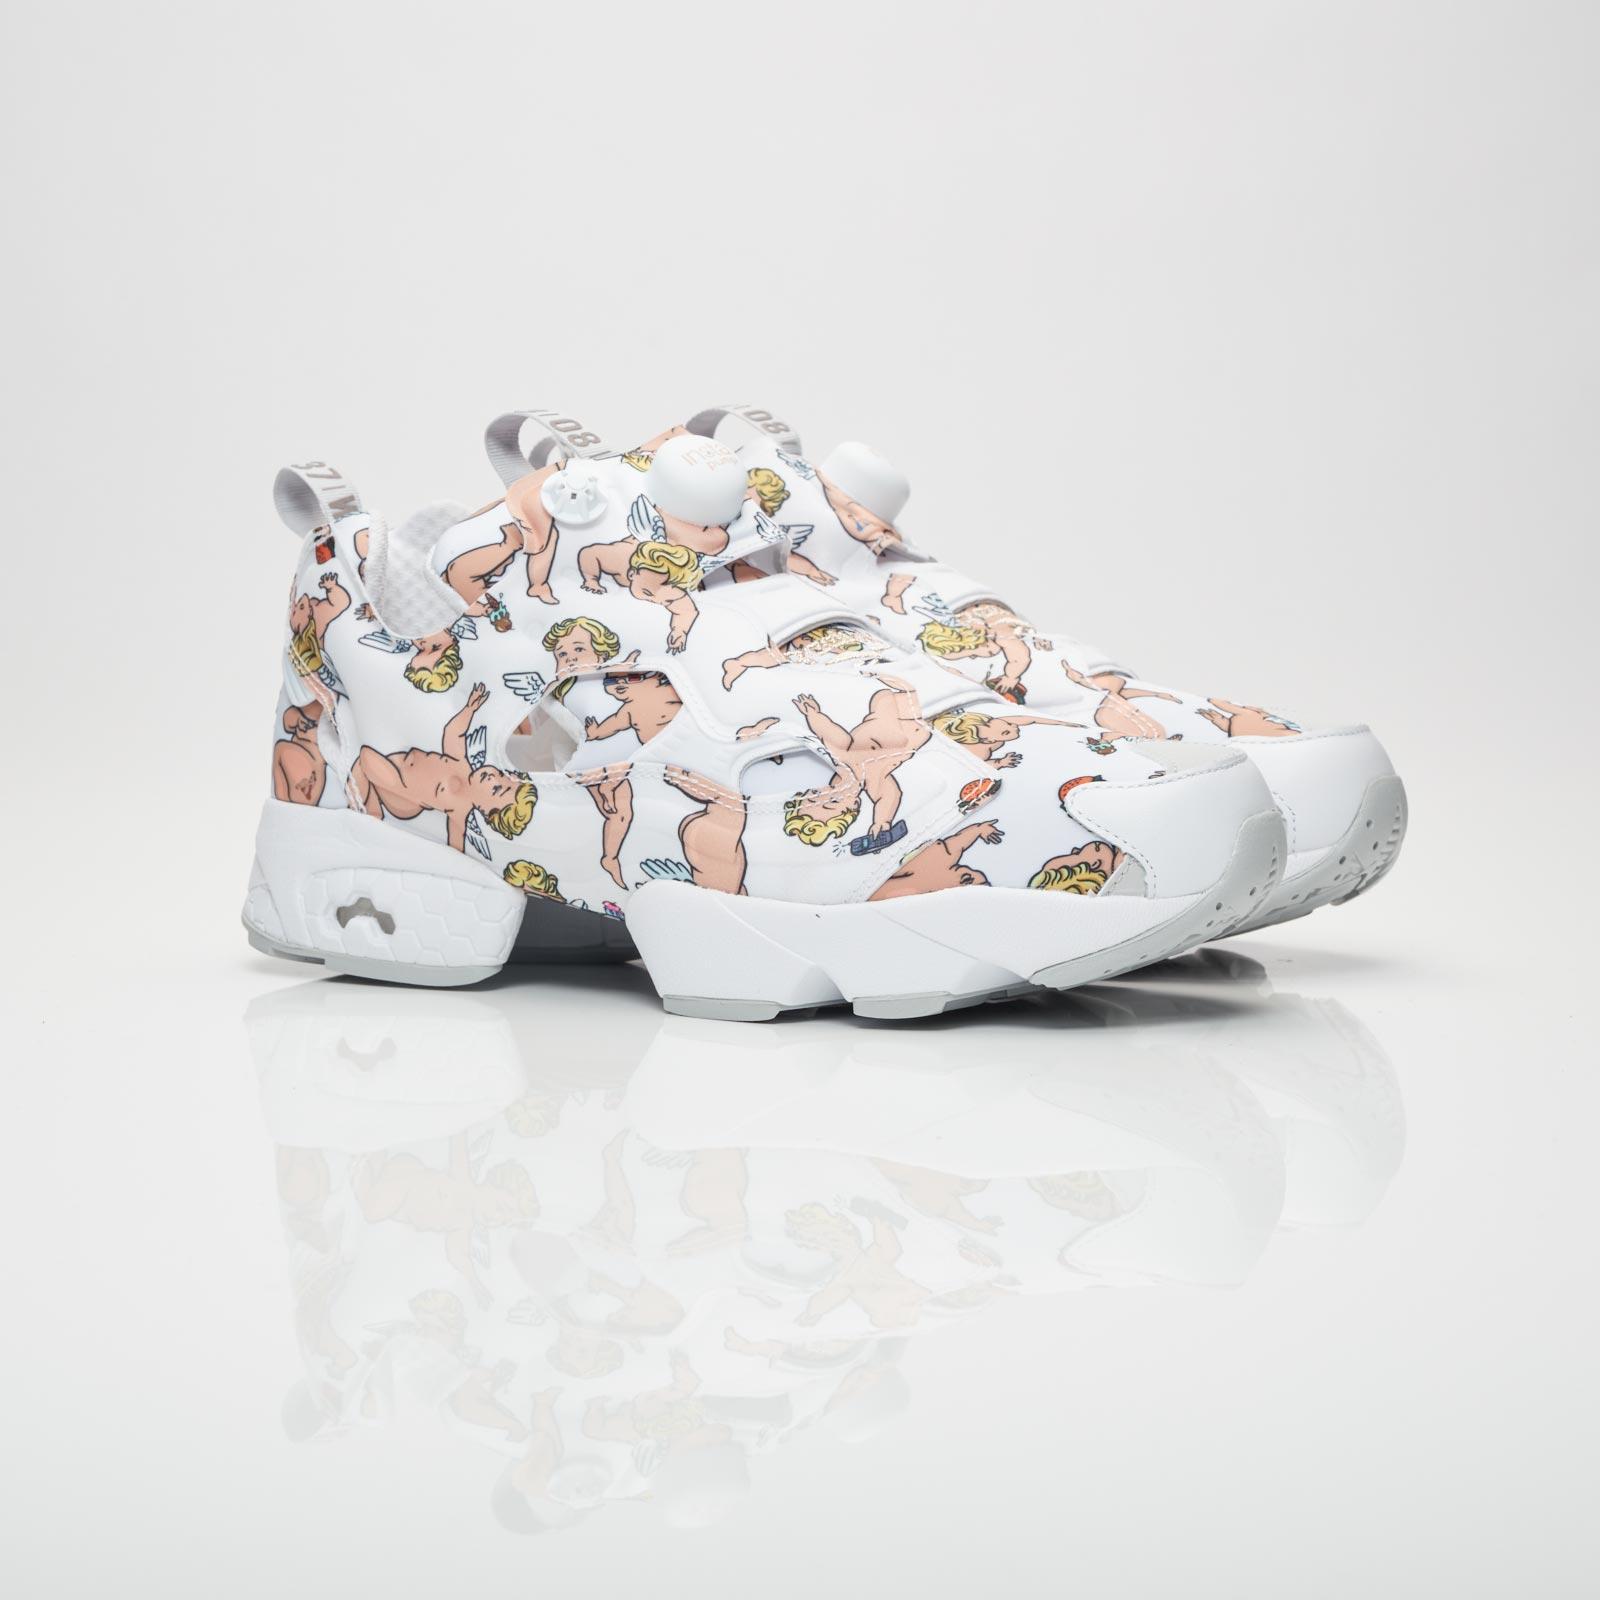 d0b4f5e6c08 Reebok Instapump Fury LA - Bd4747 - Sneakersnstuff